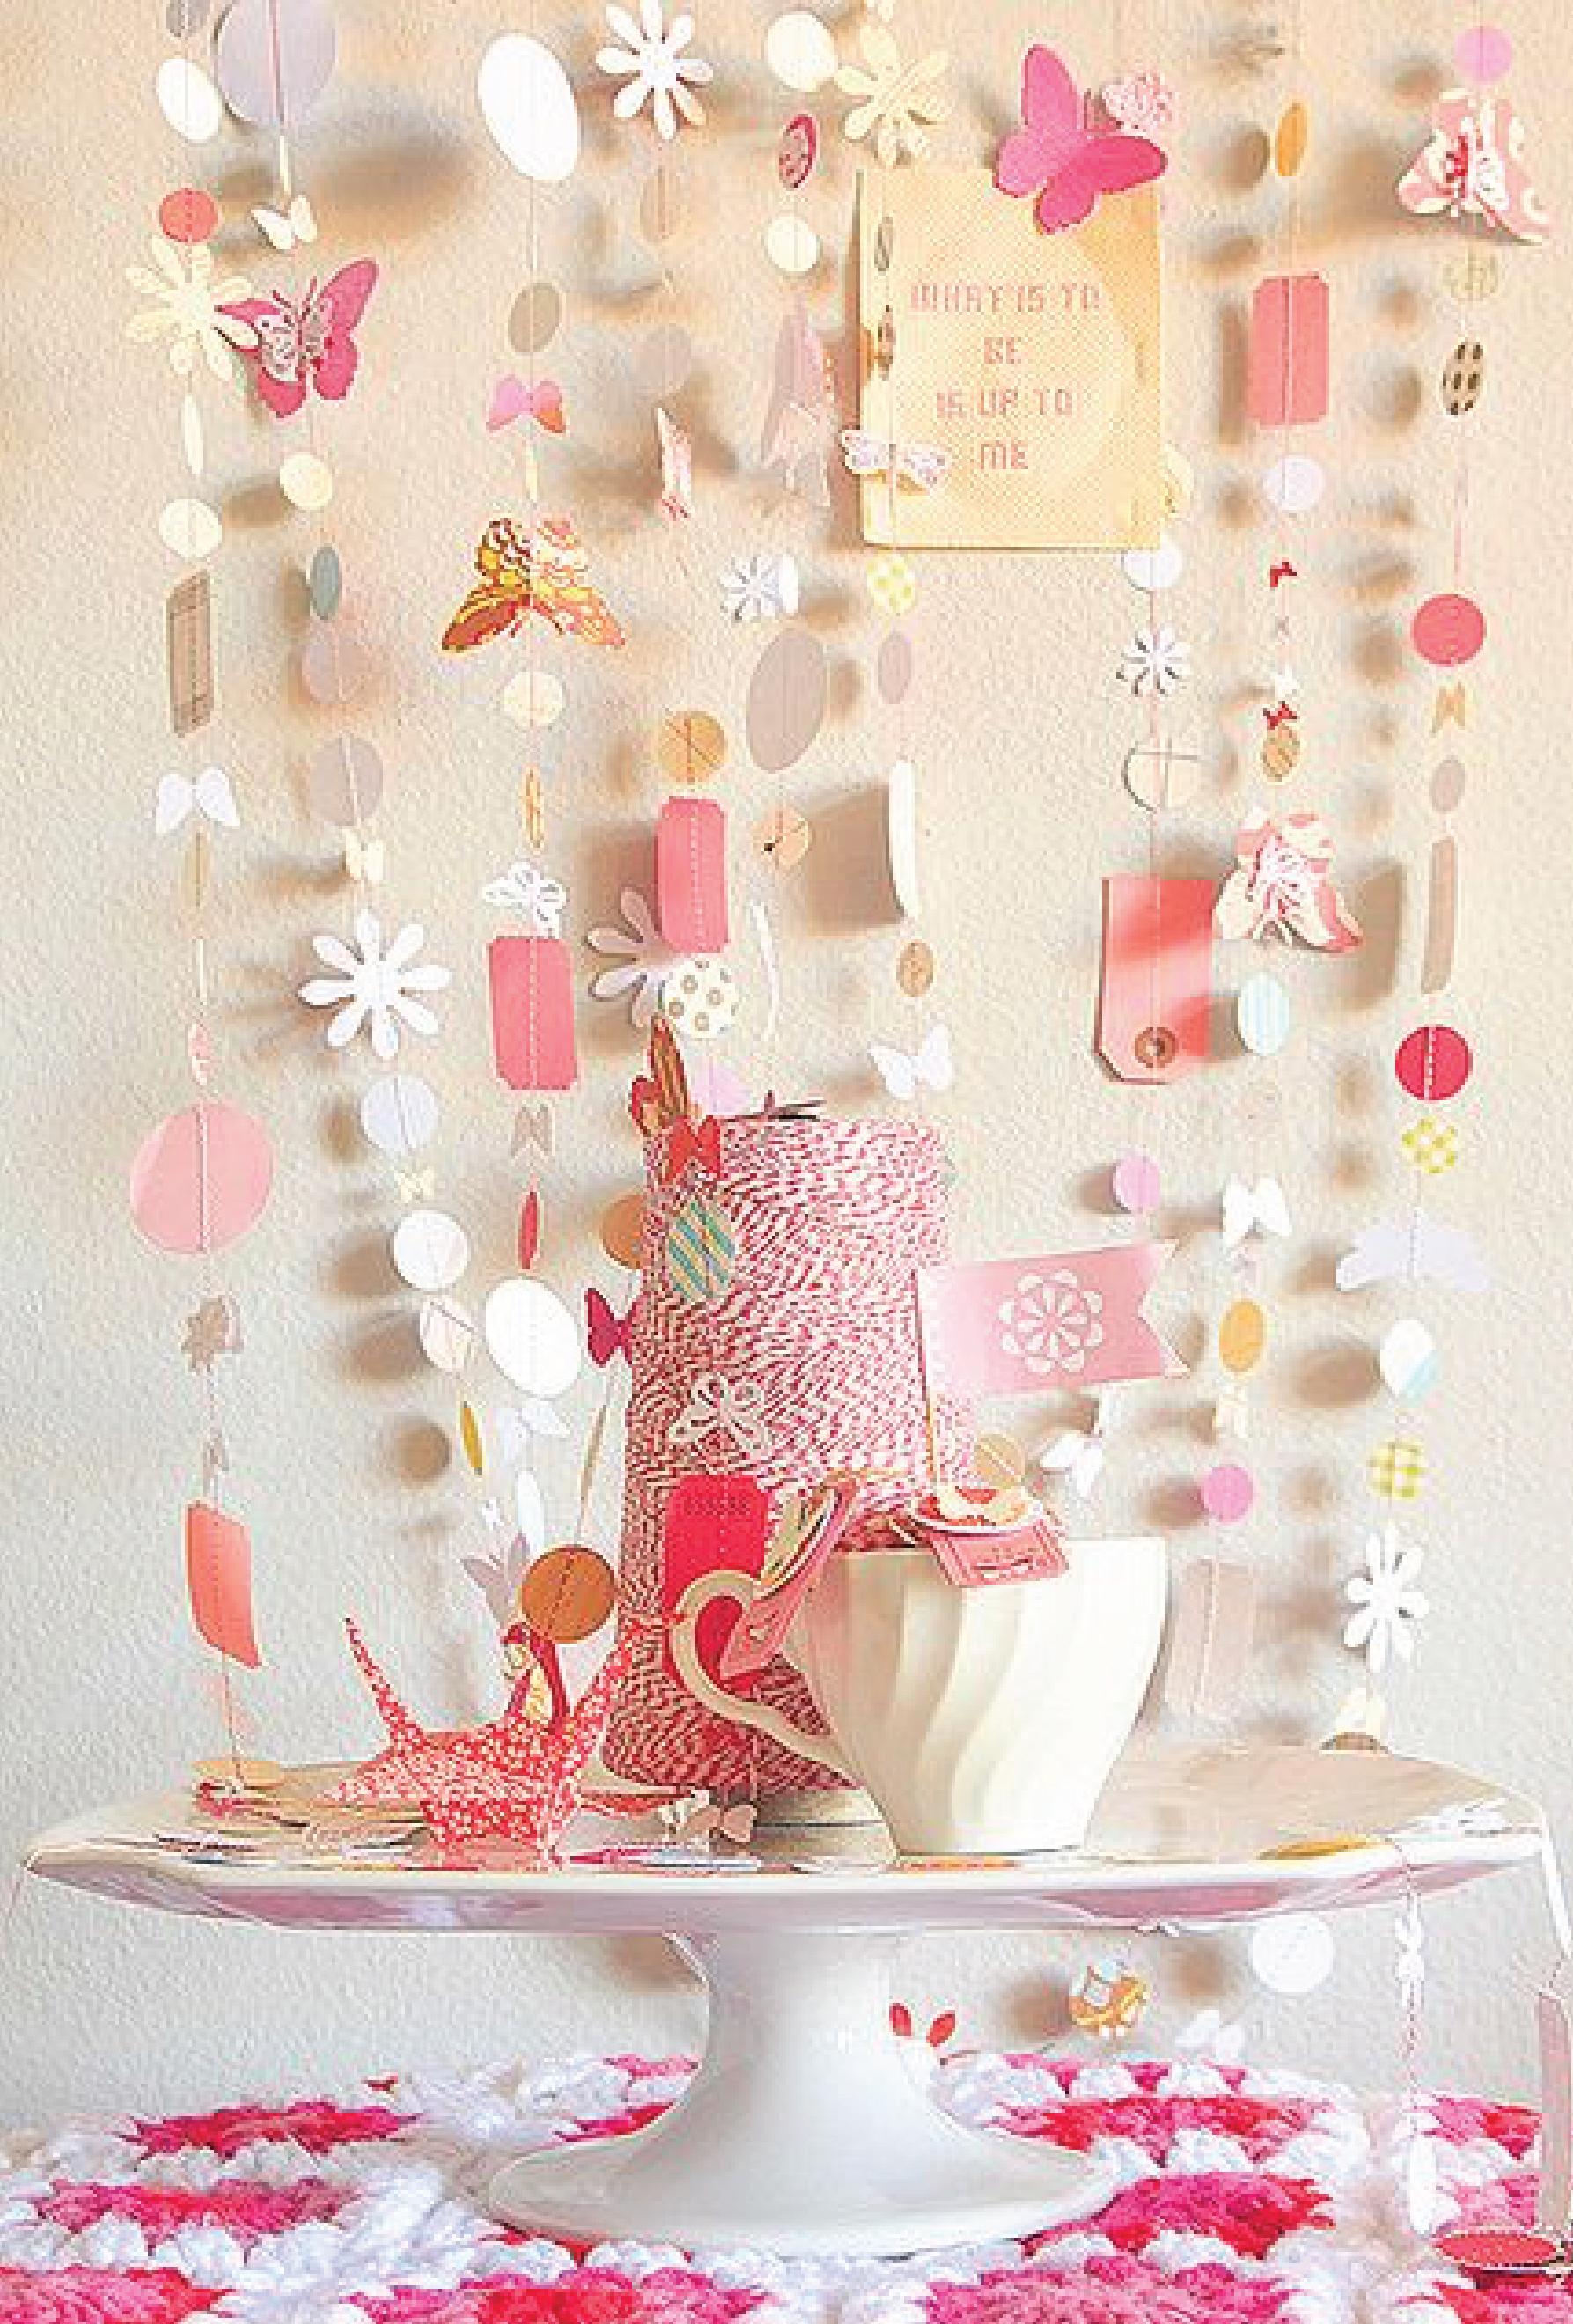 Party Garland From Debee Art Flicker